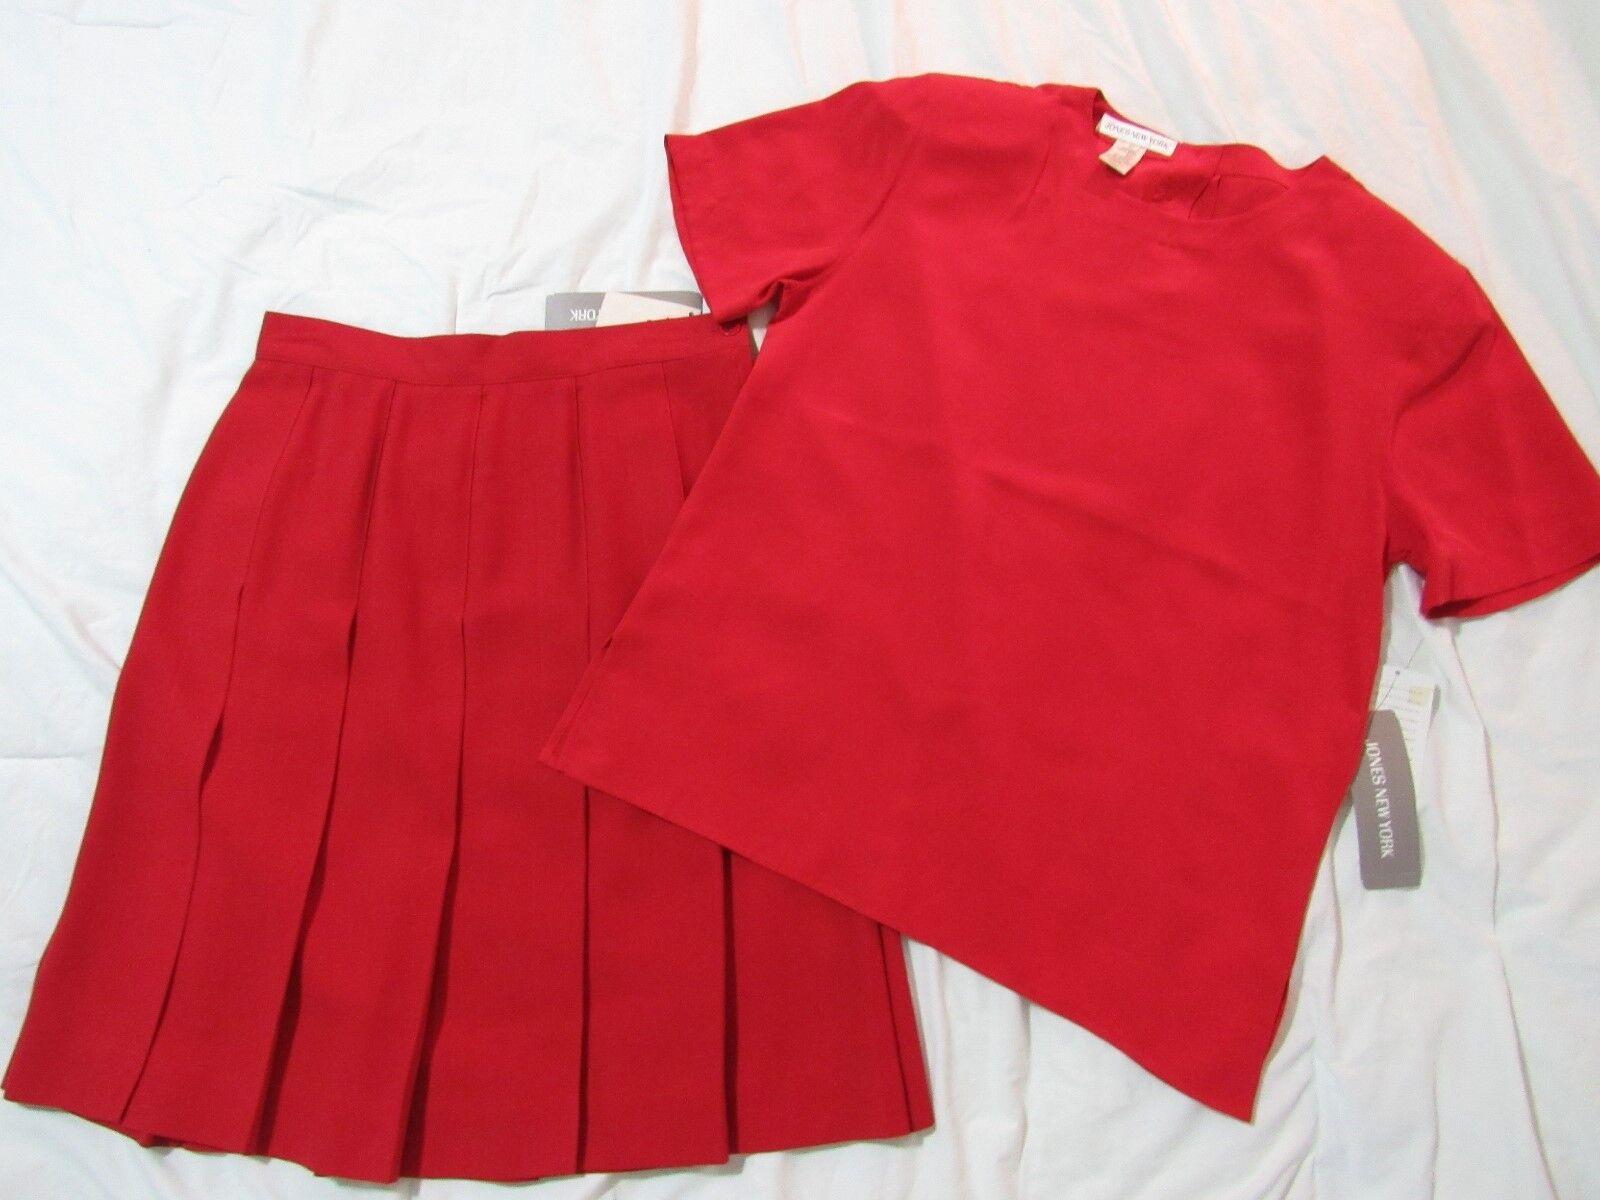 JONES NEW YORK 10 Red Pleated Wool Skirt & Short Sleeve Silk Top 2-Piece Set NWT